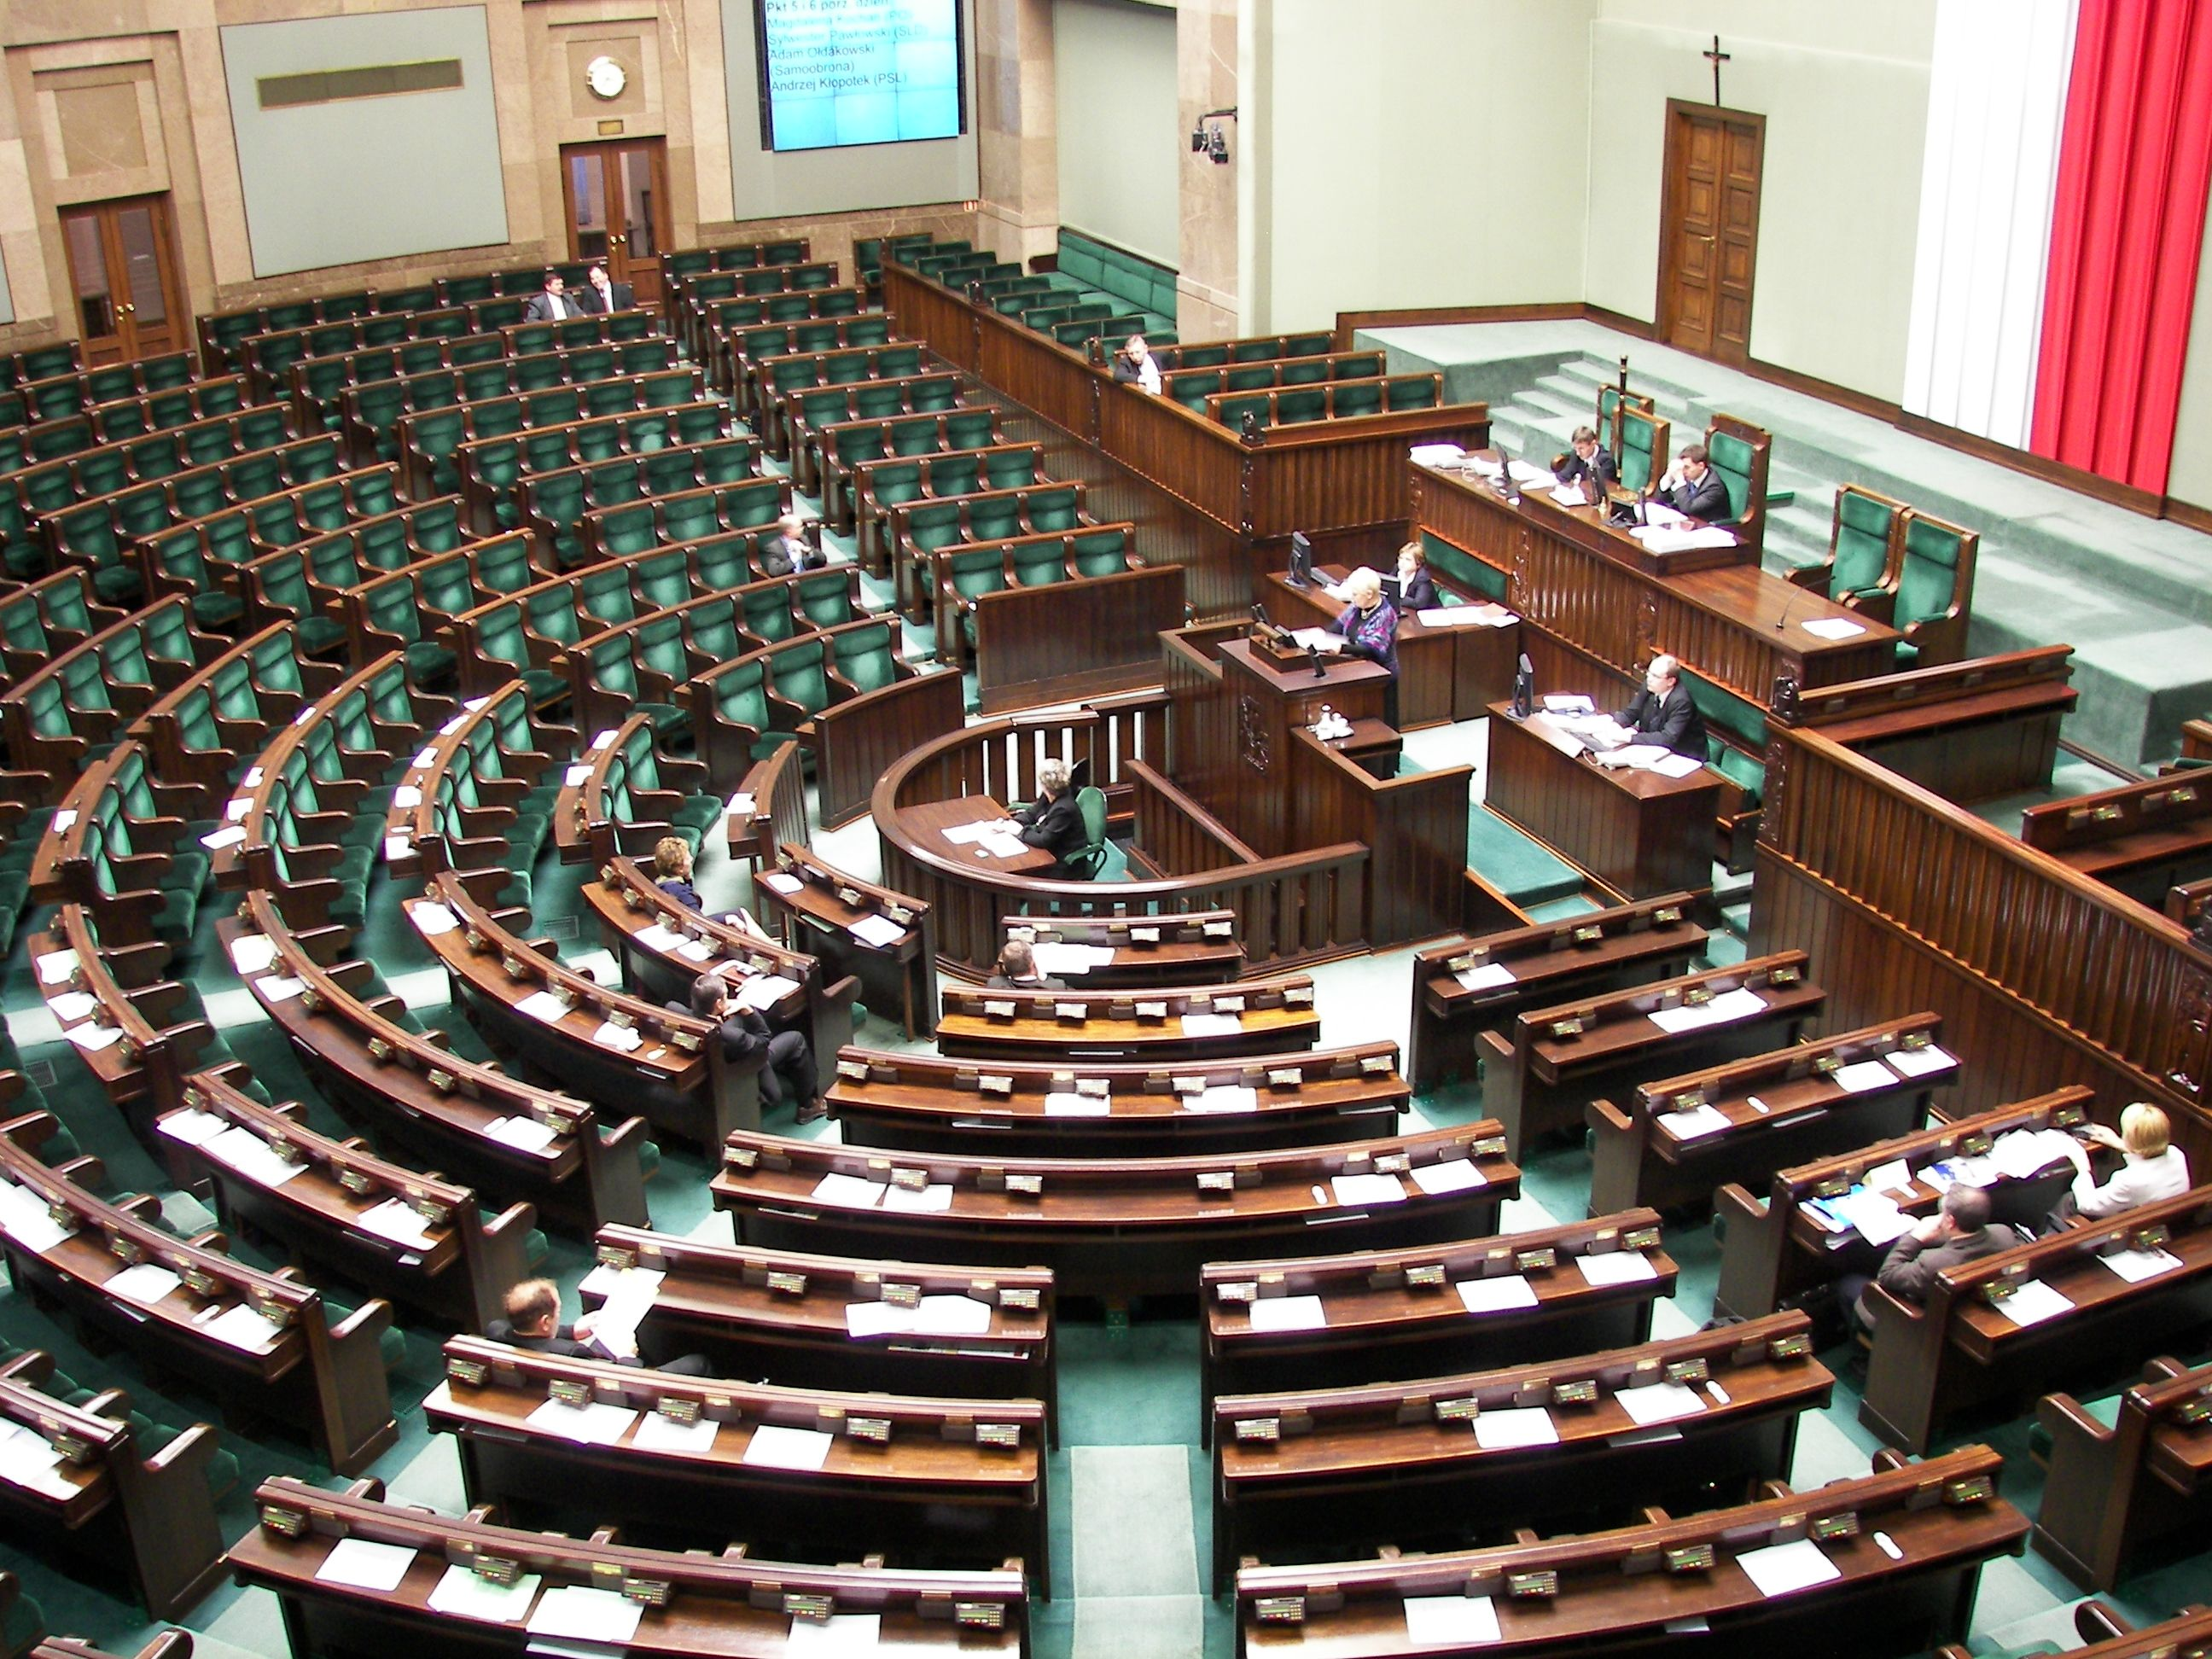 Depiction of Parlamento